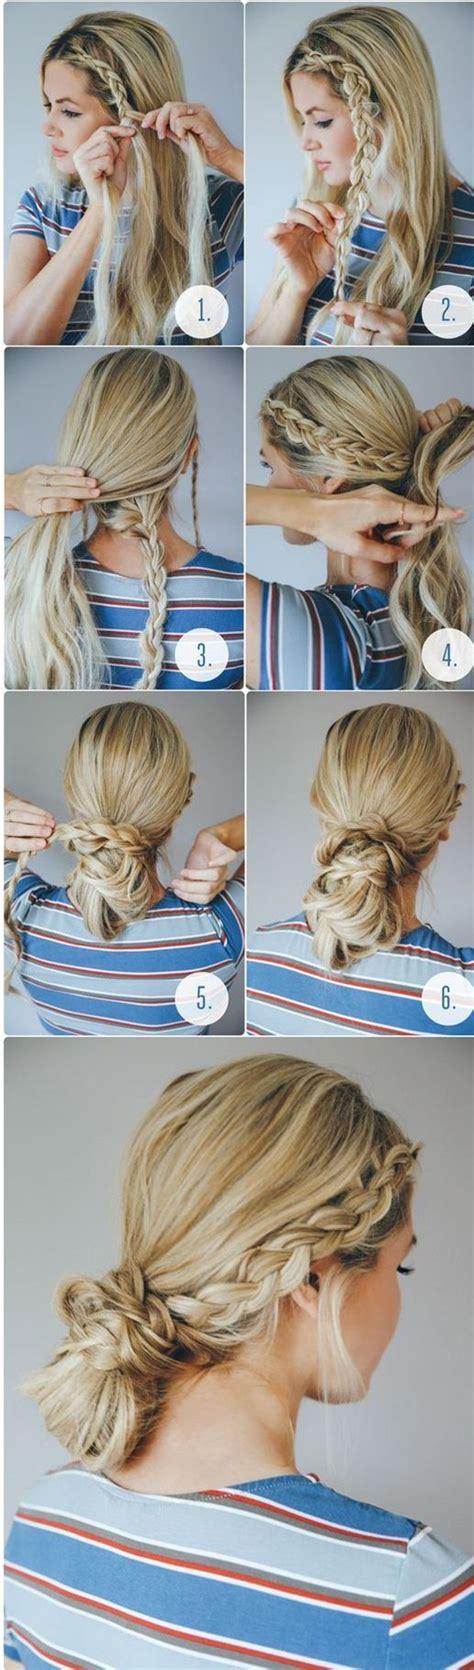 40 easy hairstyles schools 2016